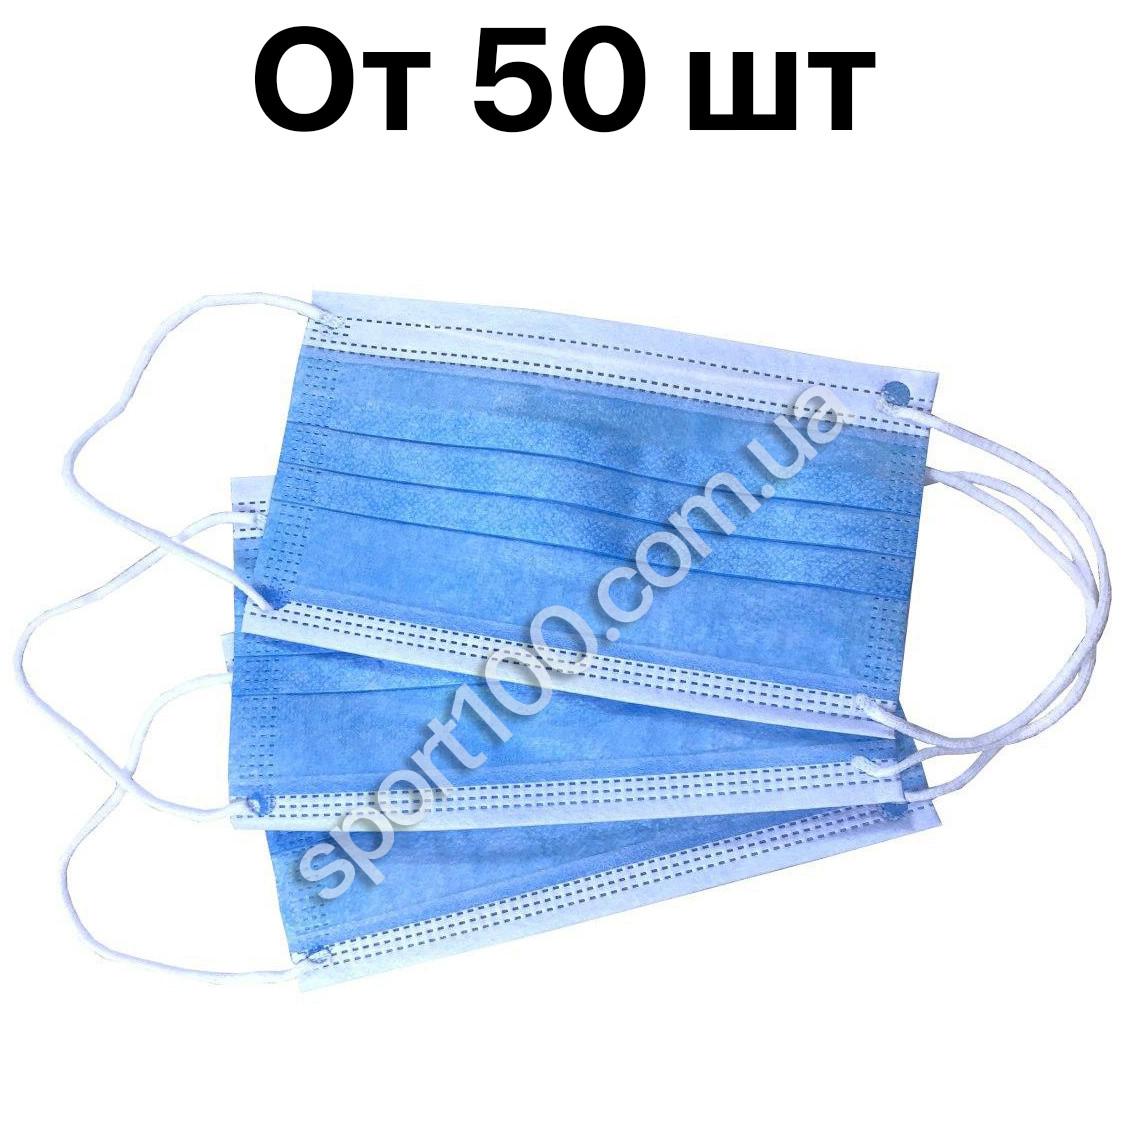 Маска защитная трехслойная для лица (заводская - пайка, фиксатор для носа)